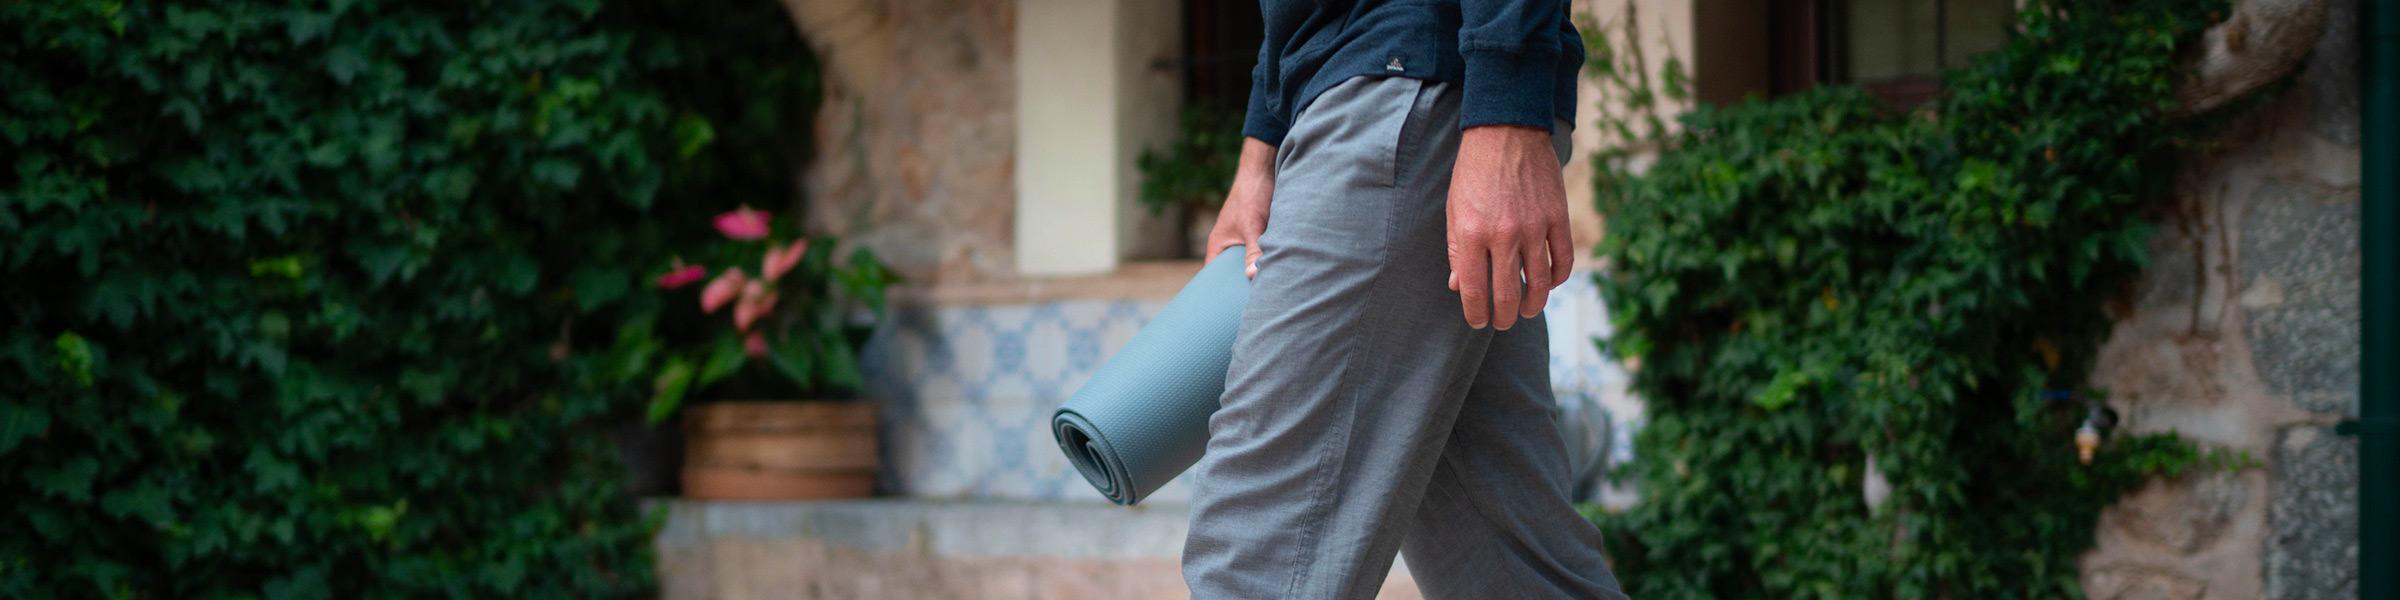 7a01c655b1 Yoga Accessories | Yoga Mat | prAna